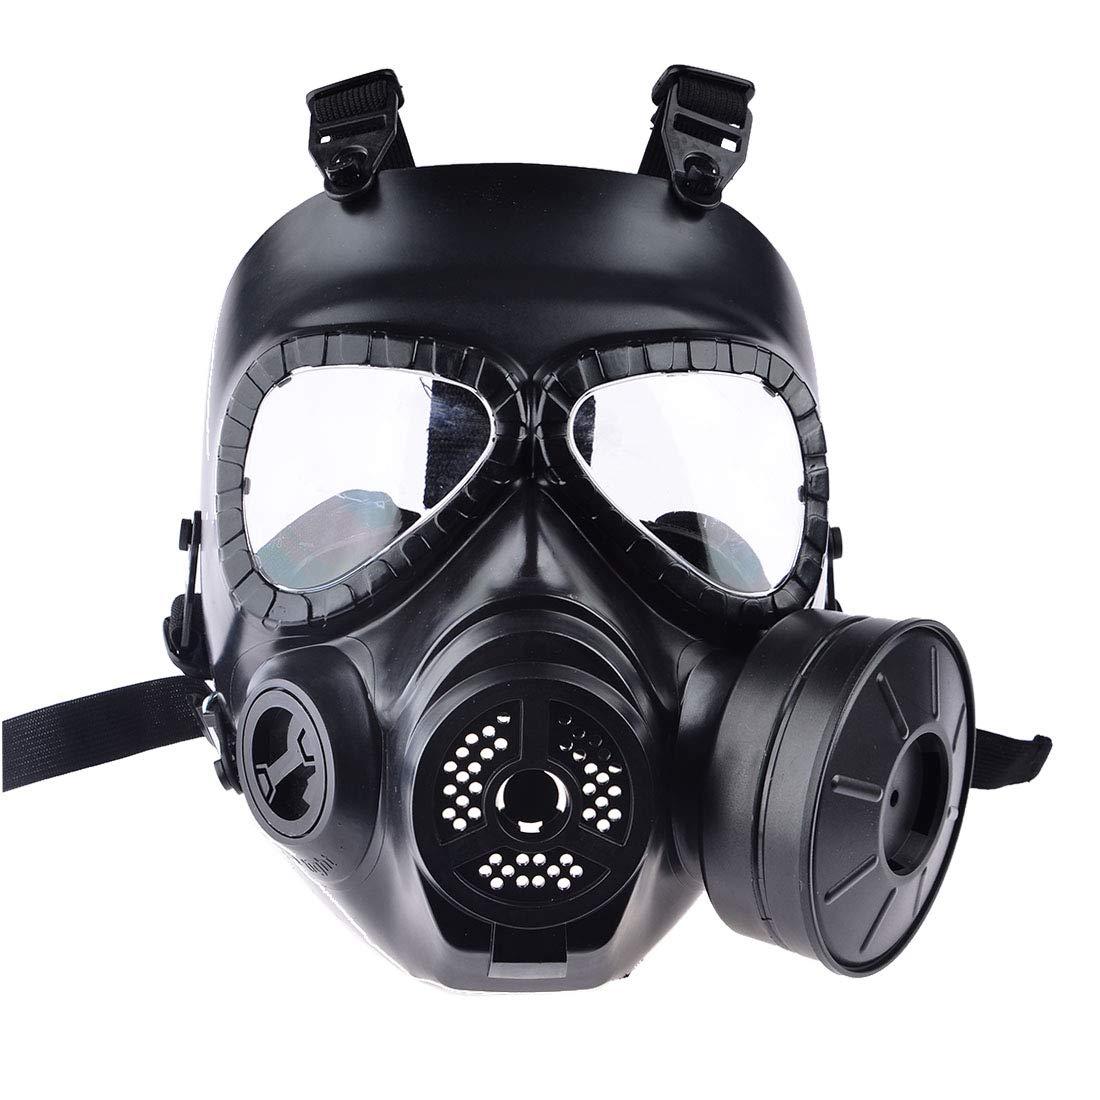 Giplar Masque Facial Tactique à gaz antibuée M04 Masque de Protection Visage Complet Masque respiratoire